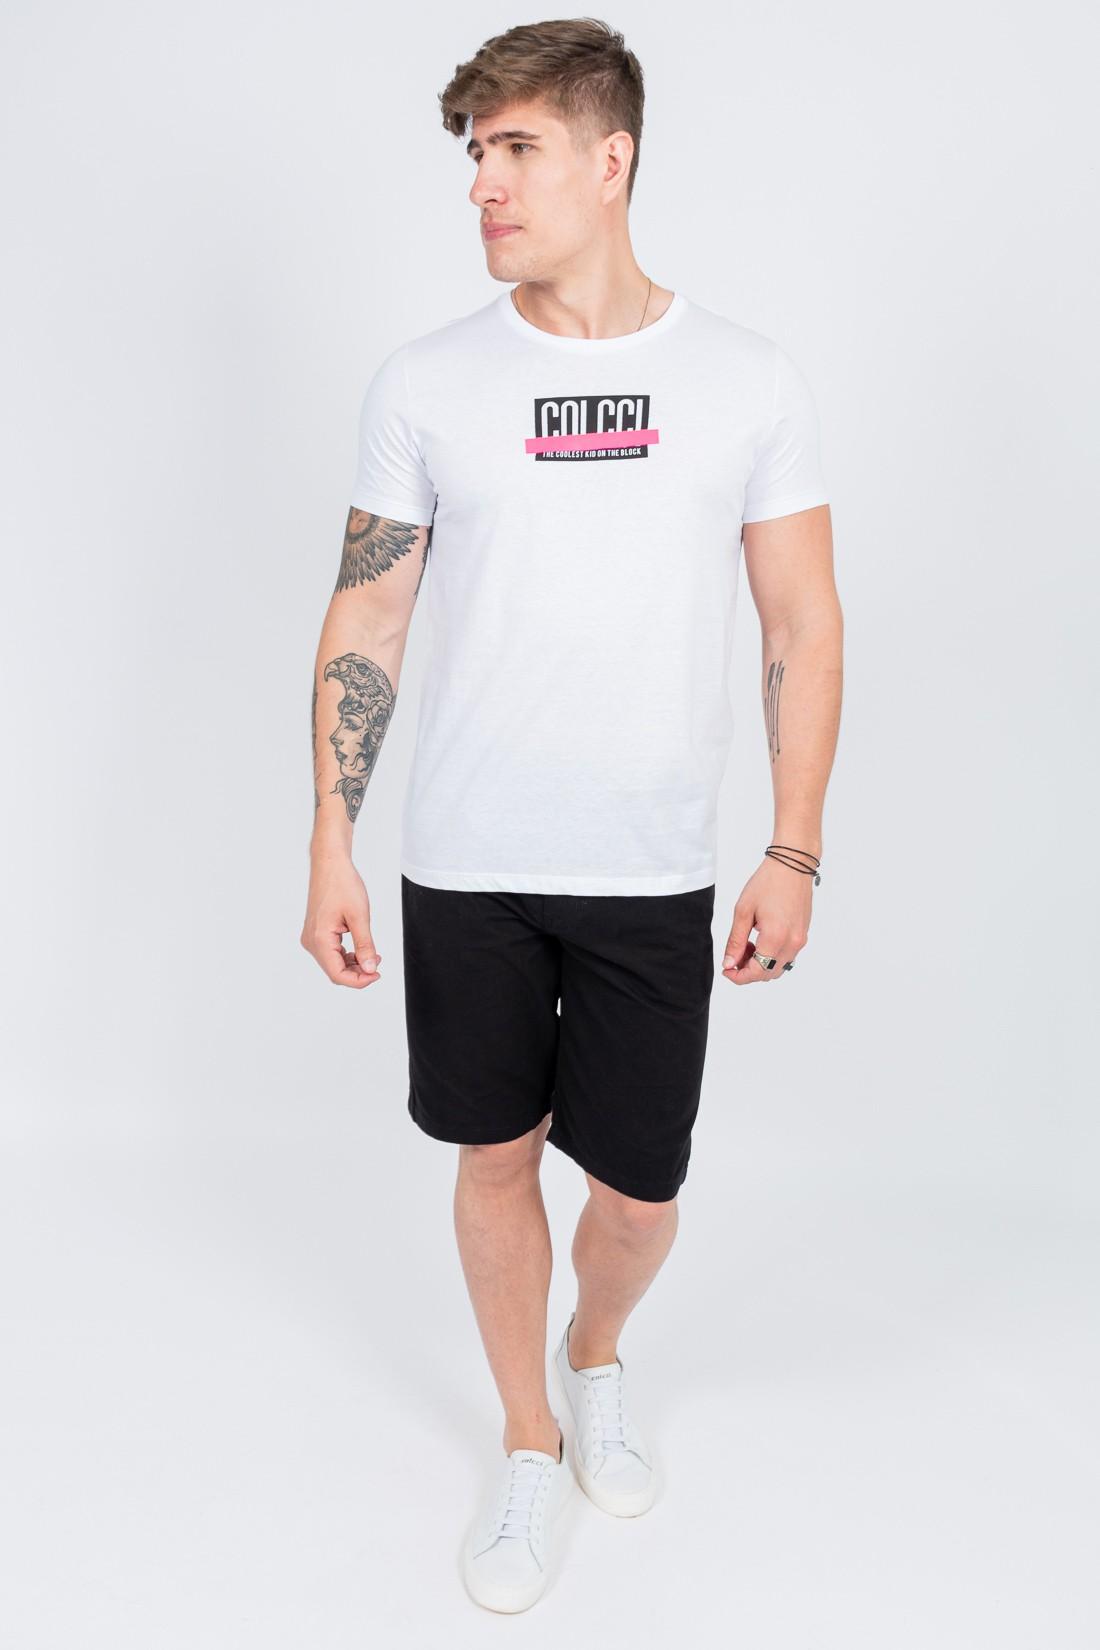 Camiseta Mc Colcci The Coolest Kid On The Block